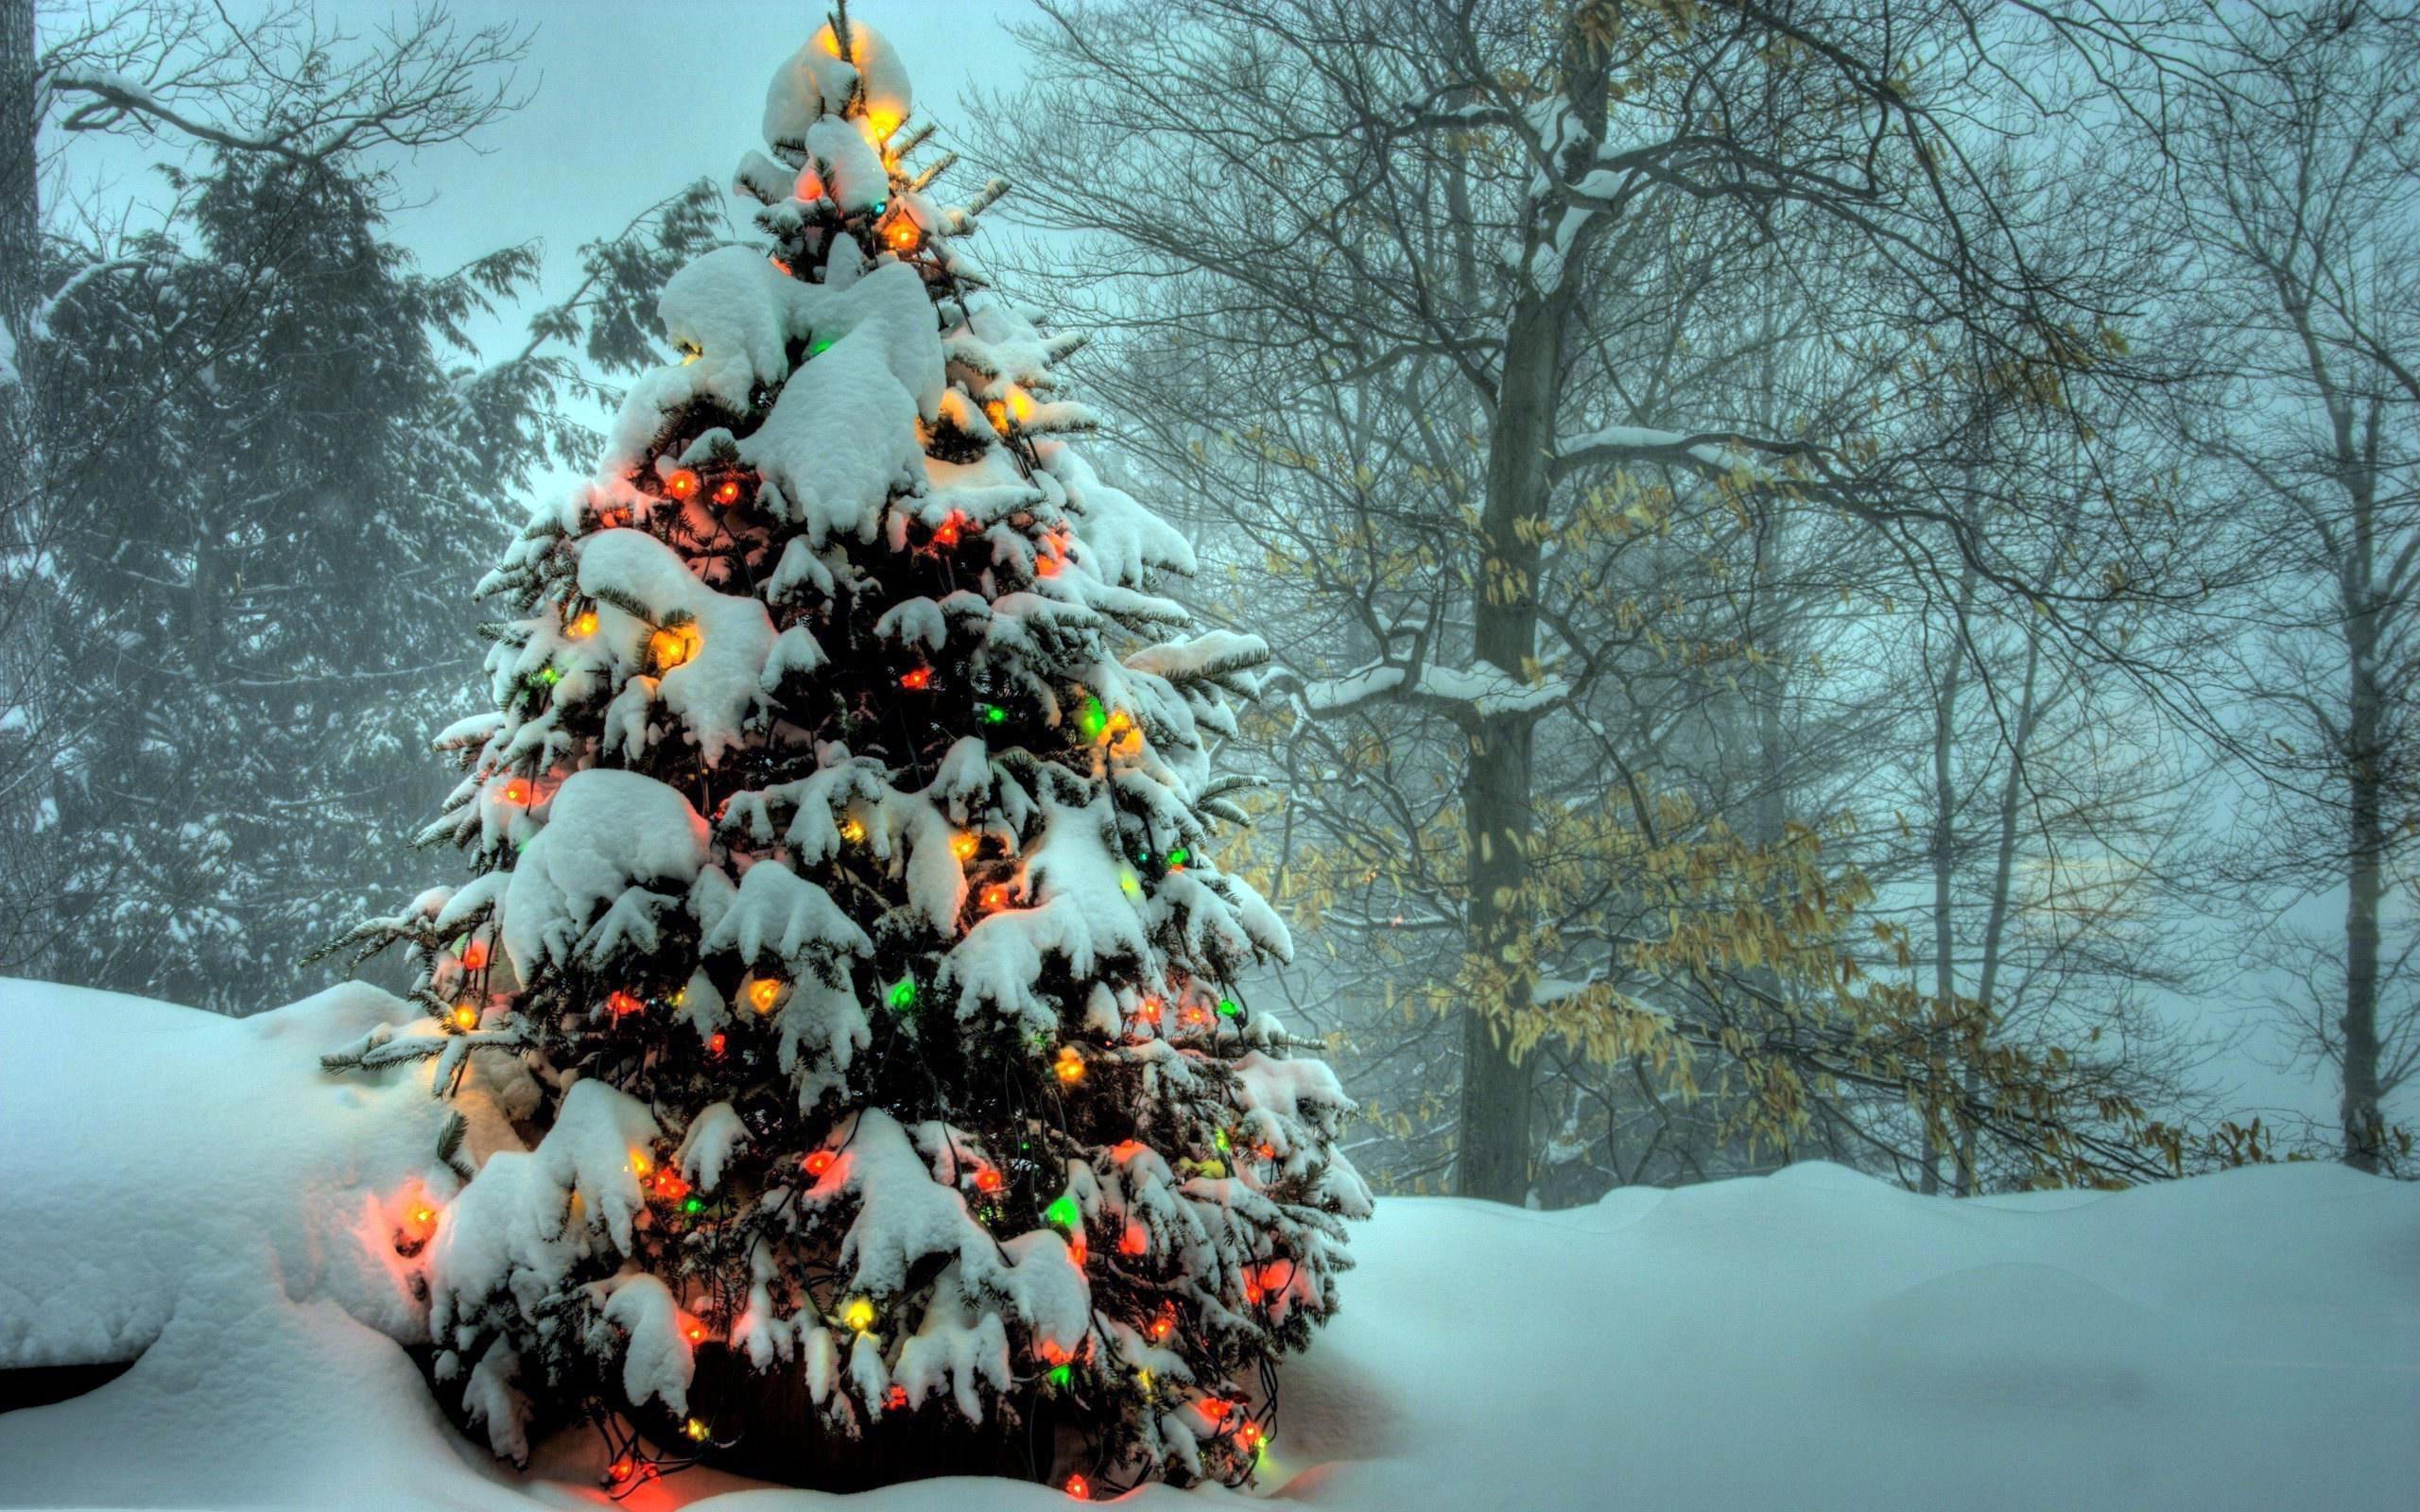 foto de Fond Ecran Gratuit Noel Pour Ordinateur – Gamboahinestrosa